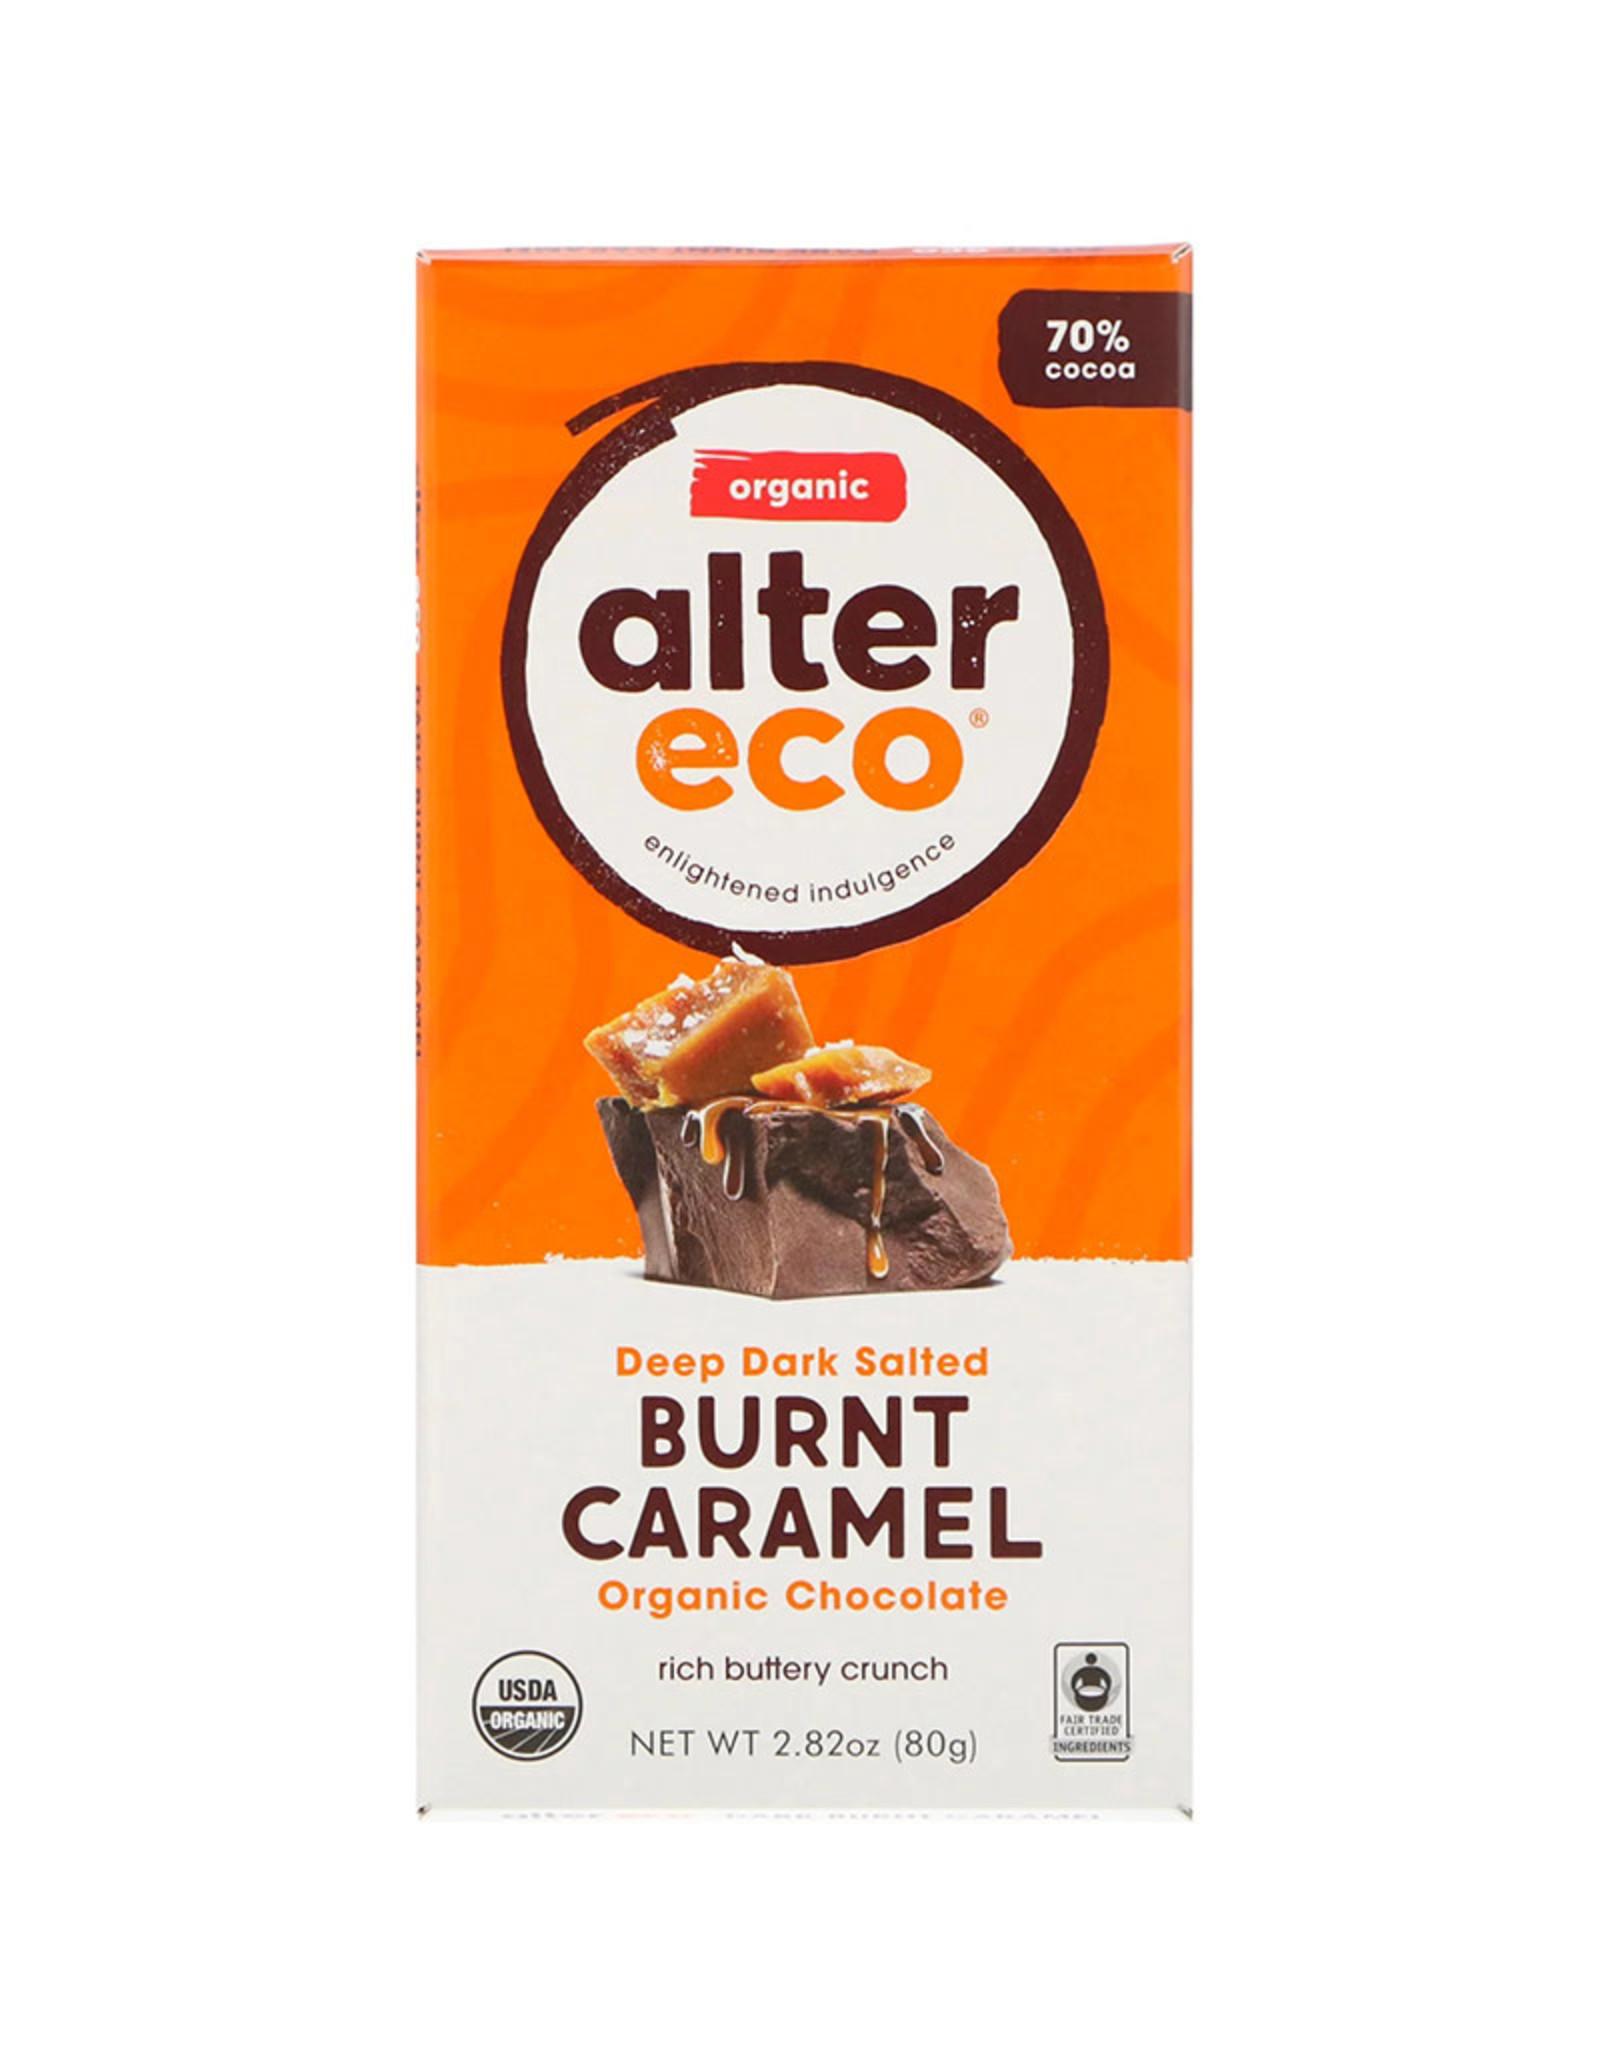 Alter Eco Alter Eco - Tablette de Chocolat Noir, Caramel Brûlé Foncé Bio (80g)